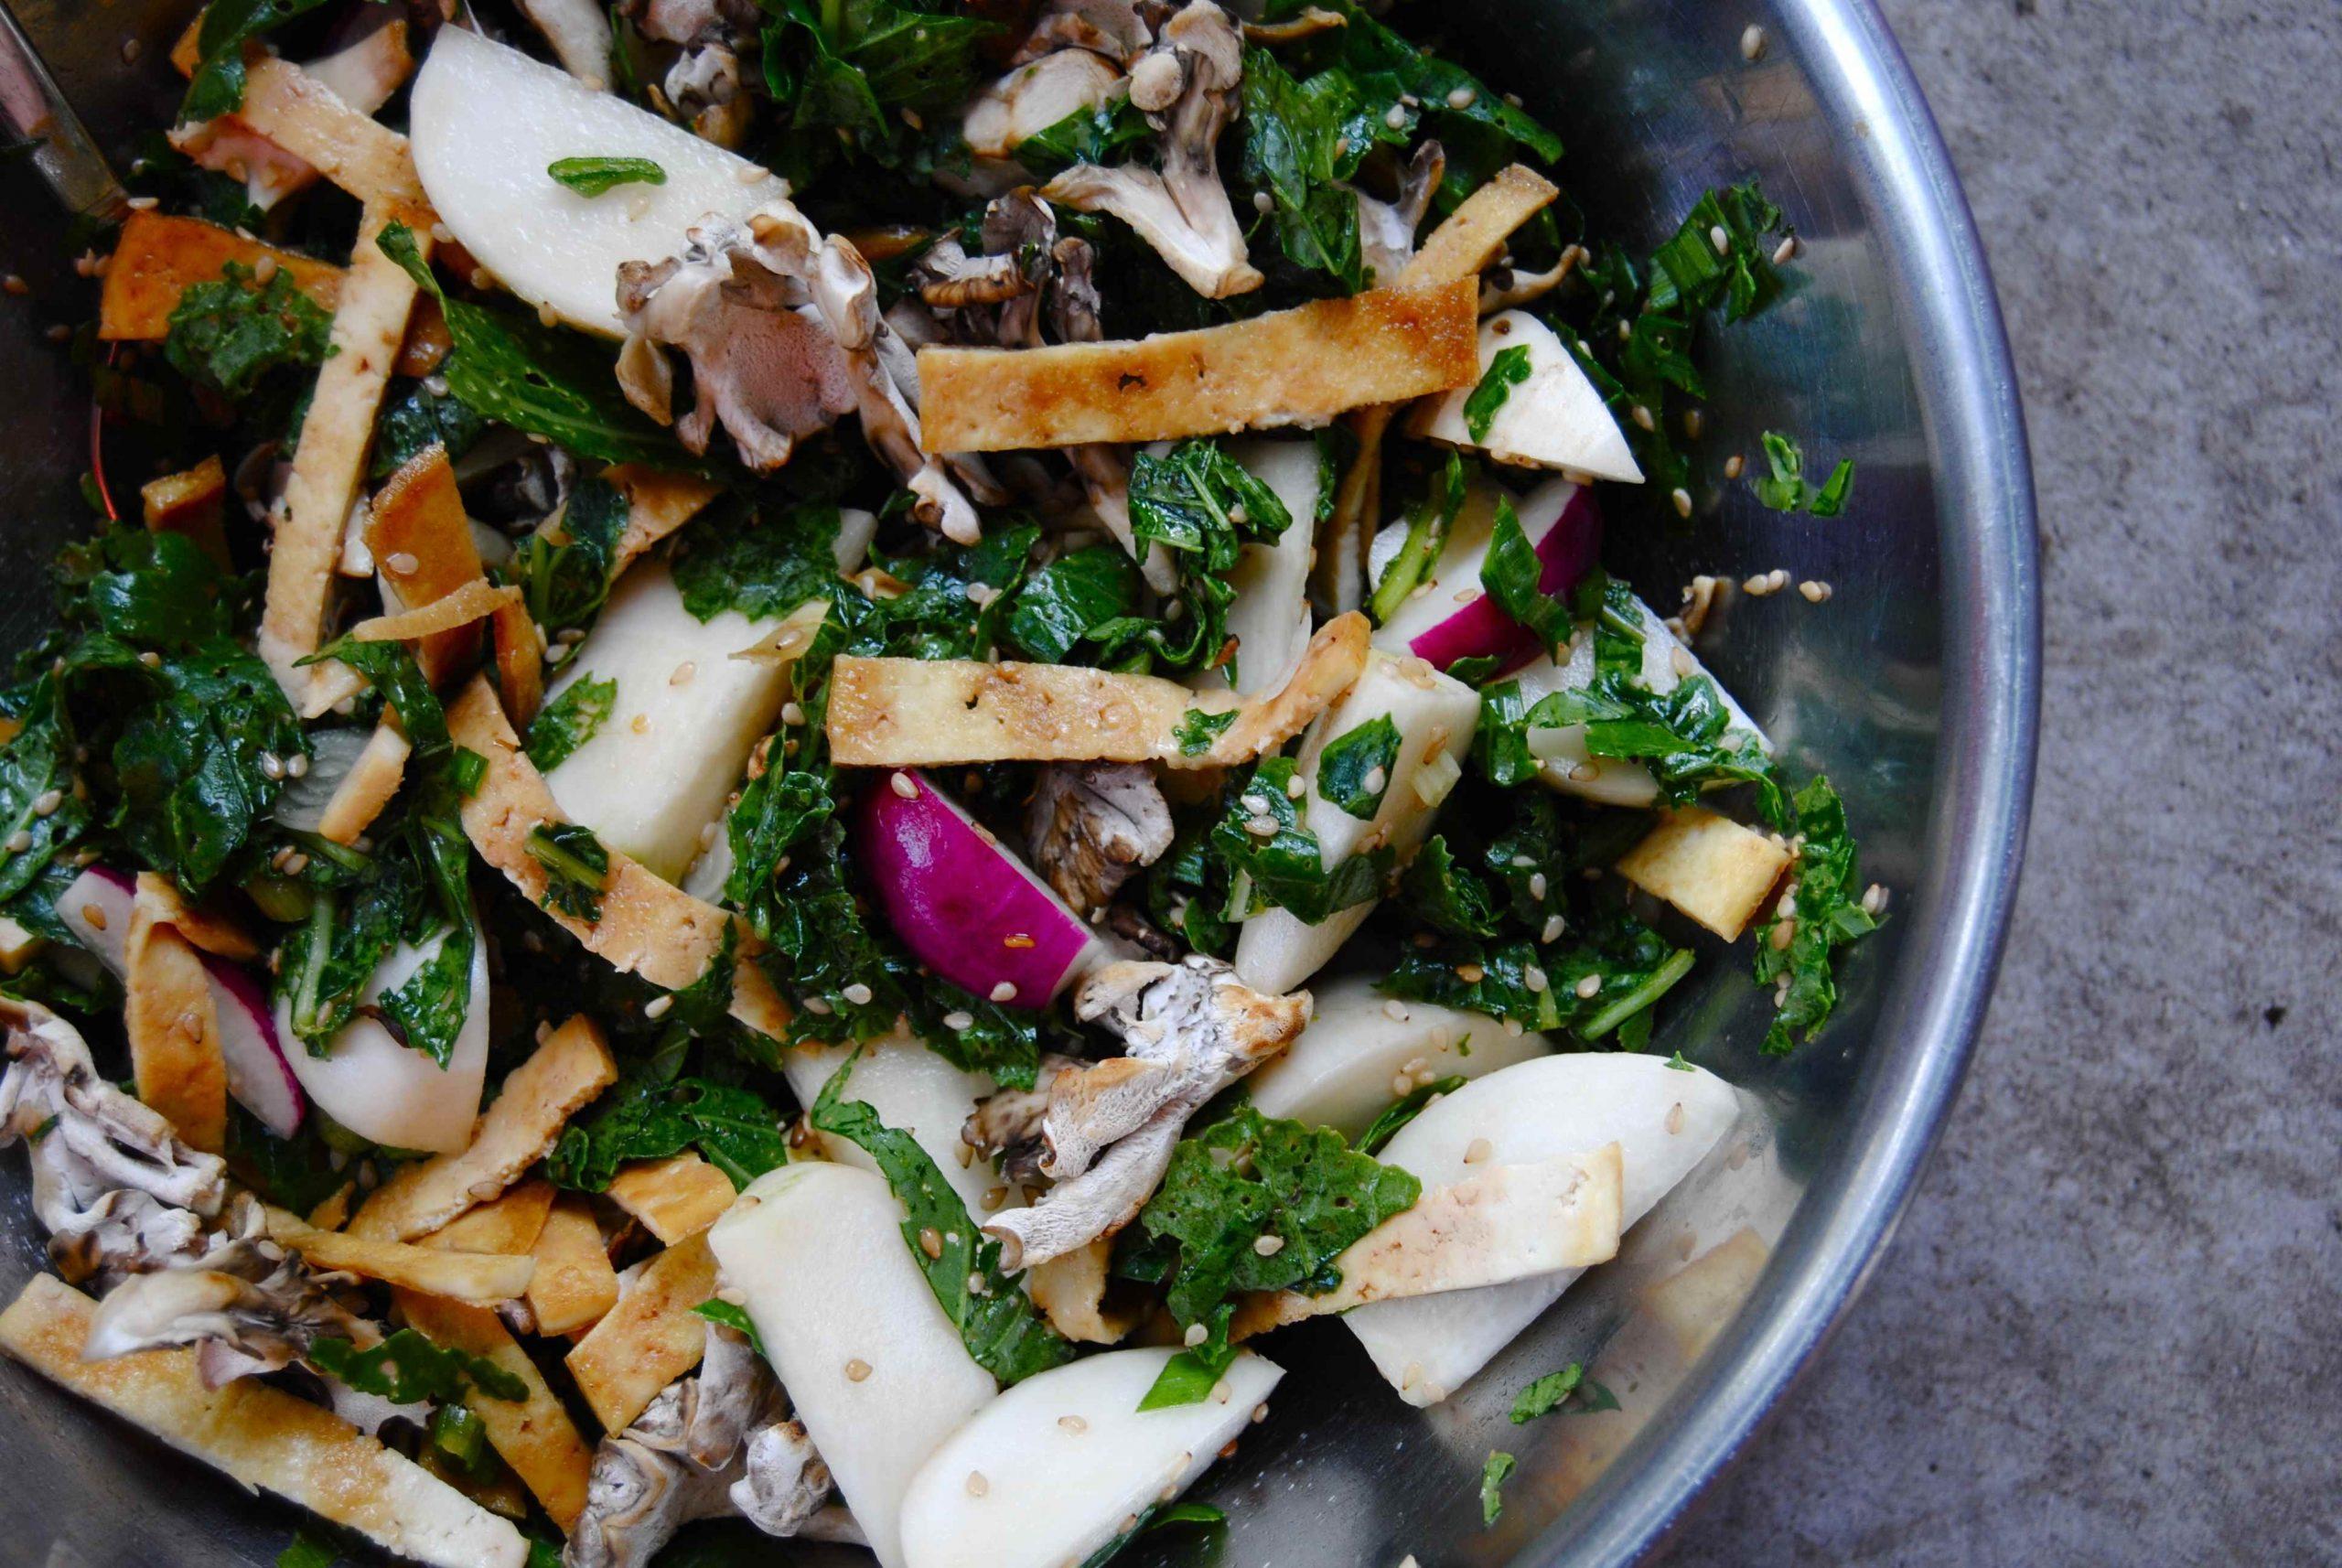 Salade asiatique de petits navets et leurs feuilles